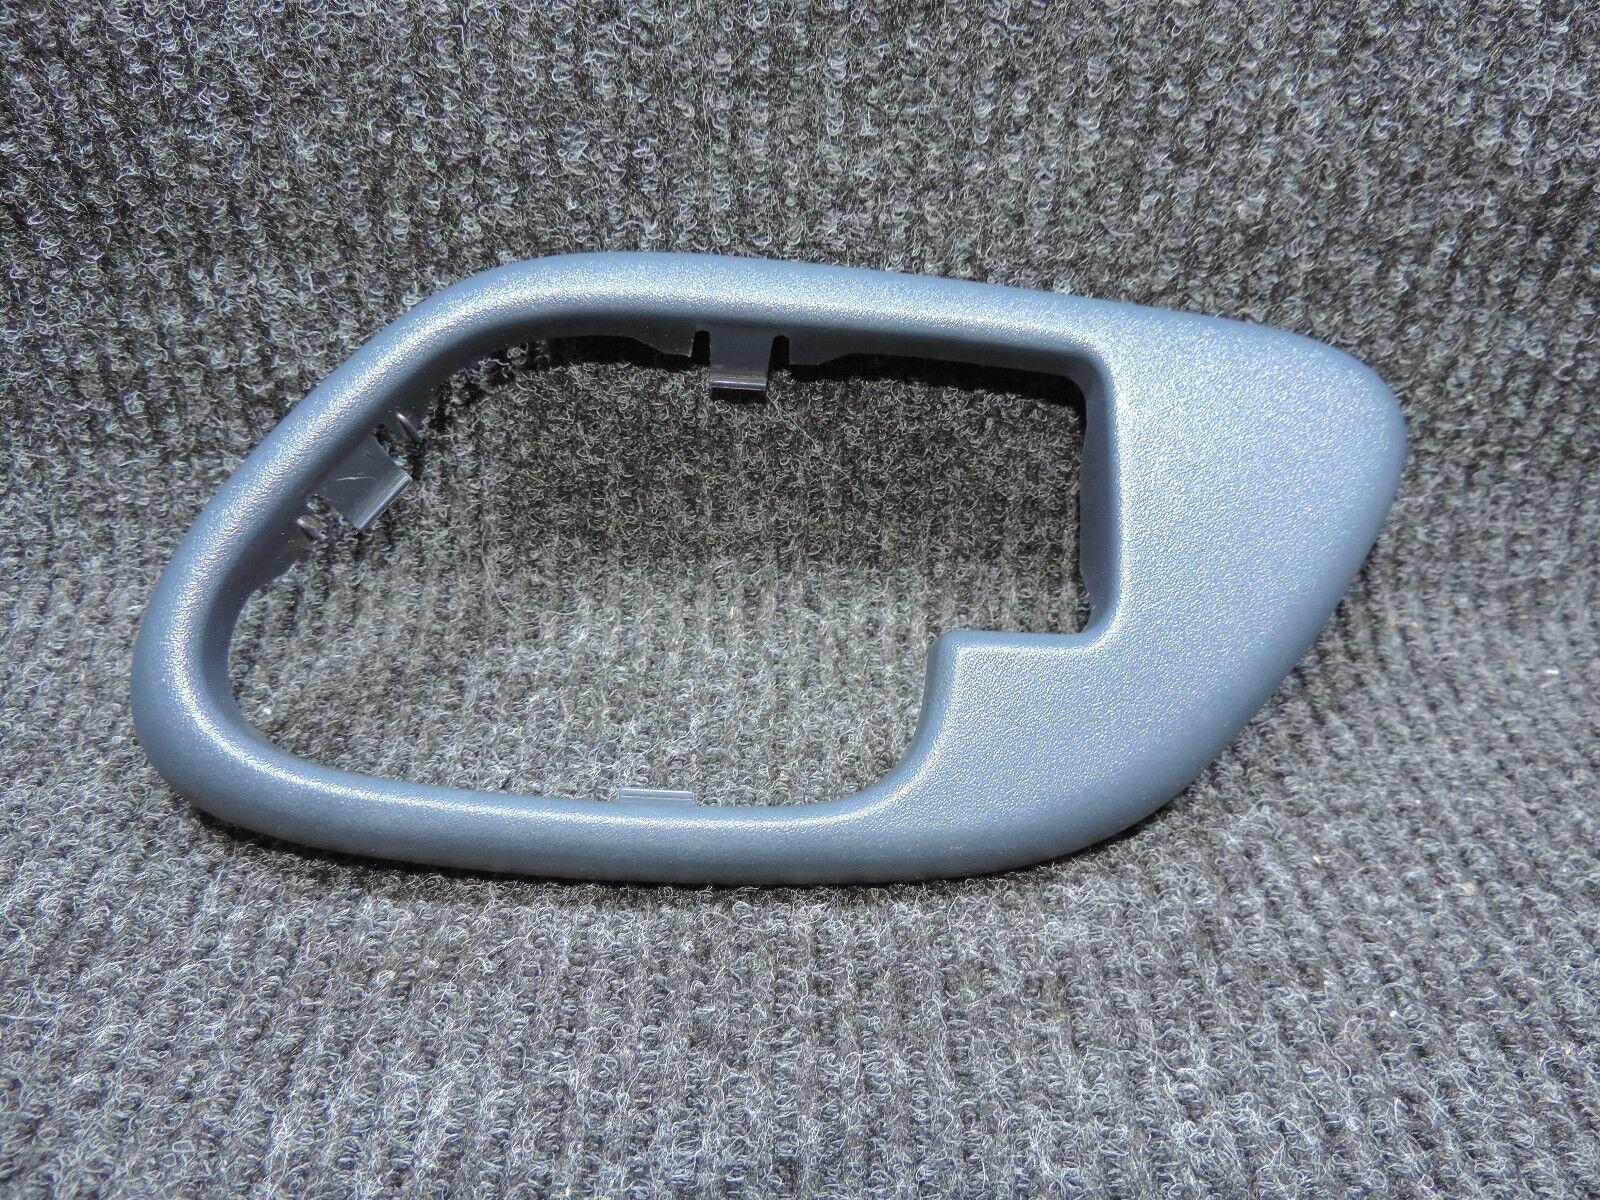 Used Chevrolet C1500 Suburban Interior Door Panels And Parts For Sale 1995 Chevy Silverado 1998 Tahoe Blue Passenger Side Handle Trim